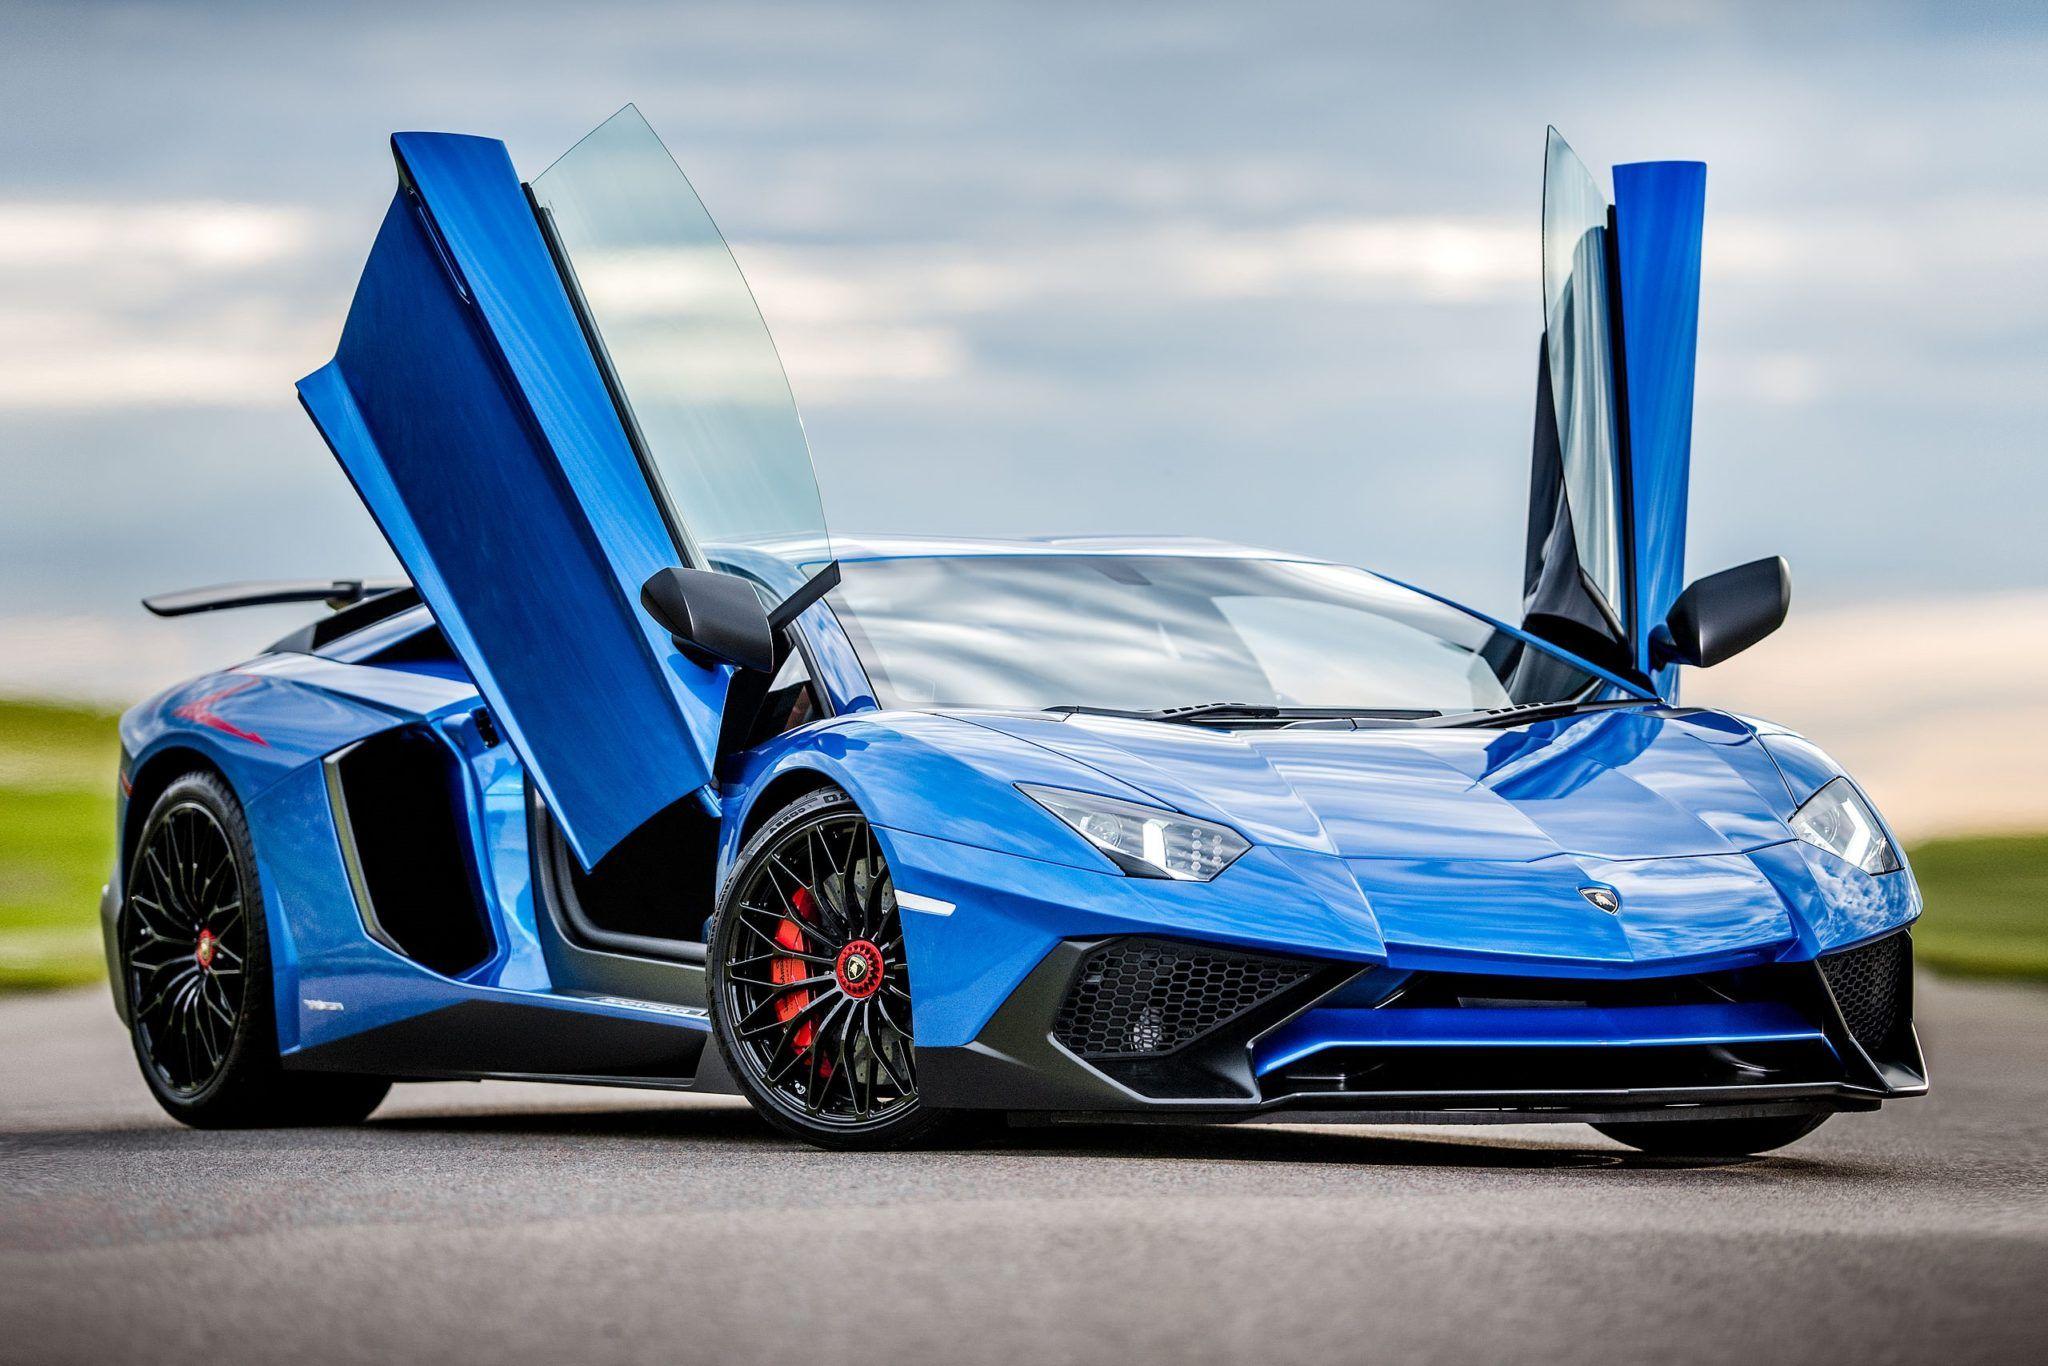 Supercar Rental In Dubai Super Cars Best Luxury Cars Dream Cars Lamborghini